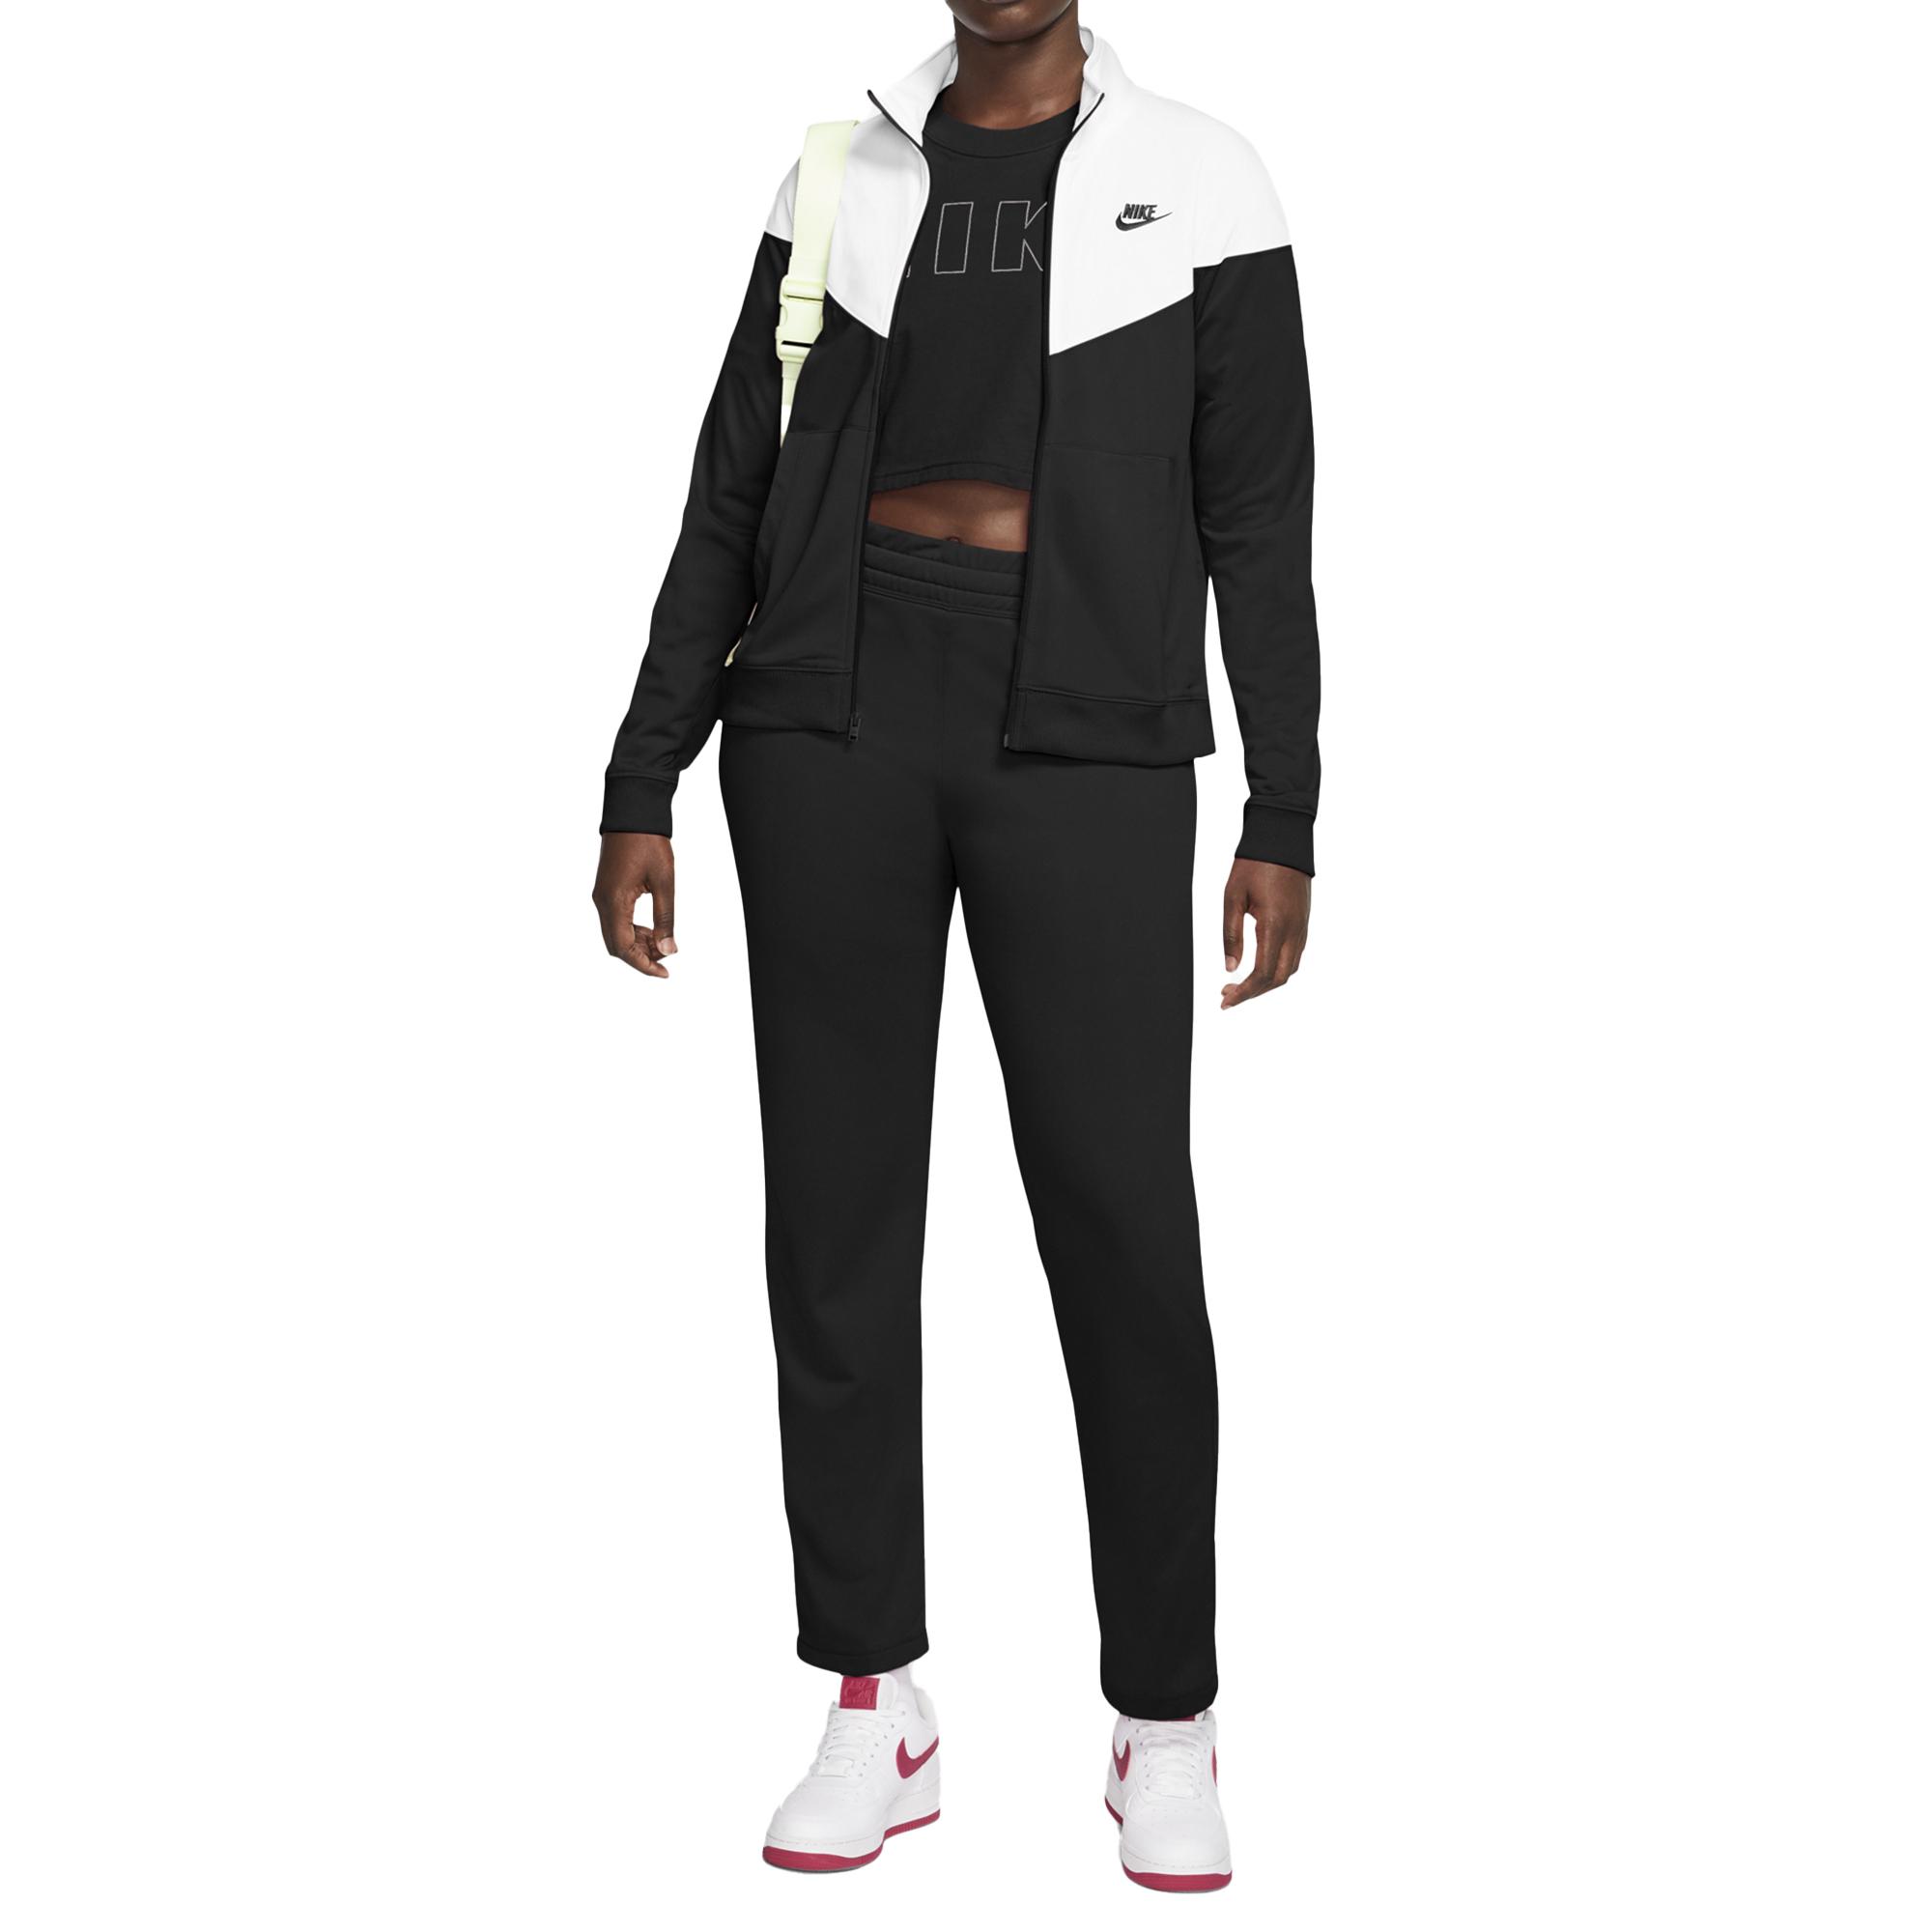 Detalles de Chándal Mujer Nike Ropa Deportiva Pk Negra Código BV4958 010